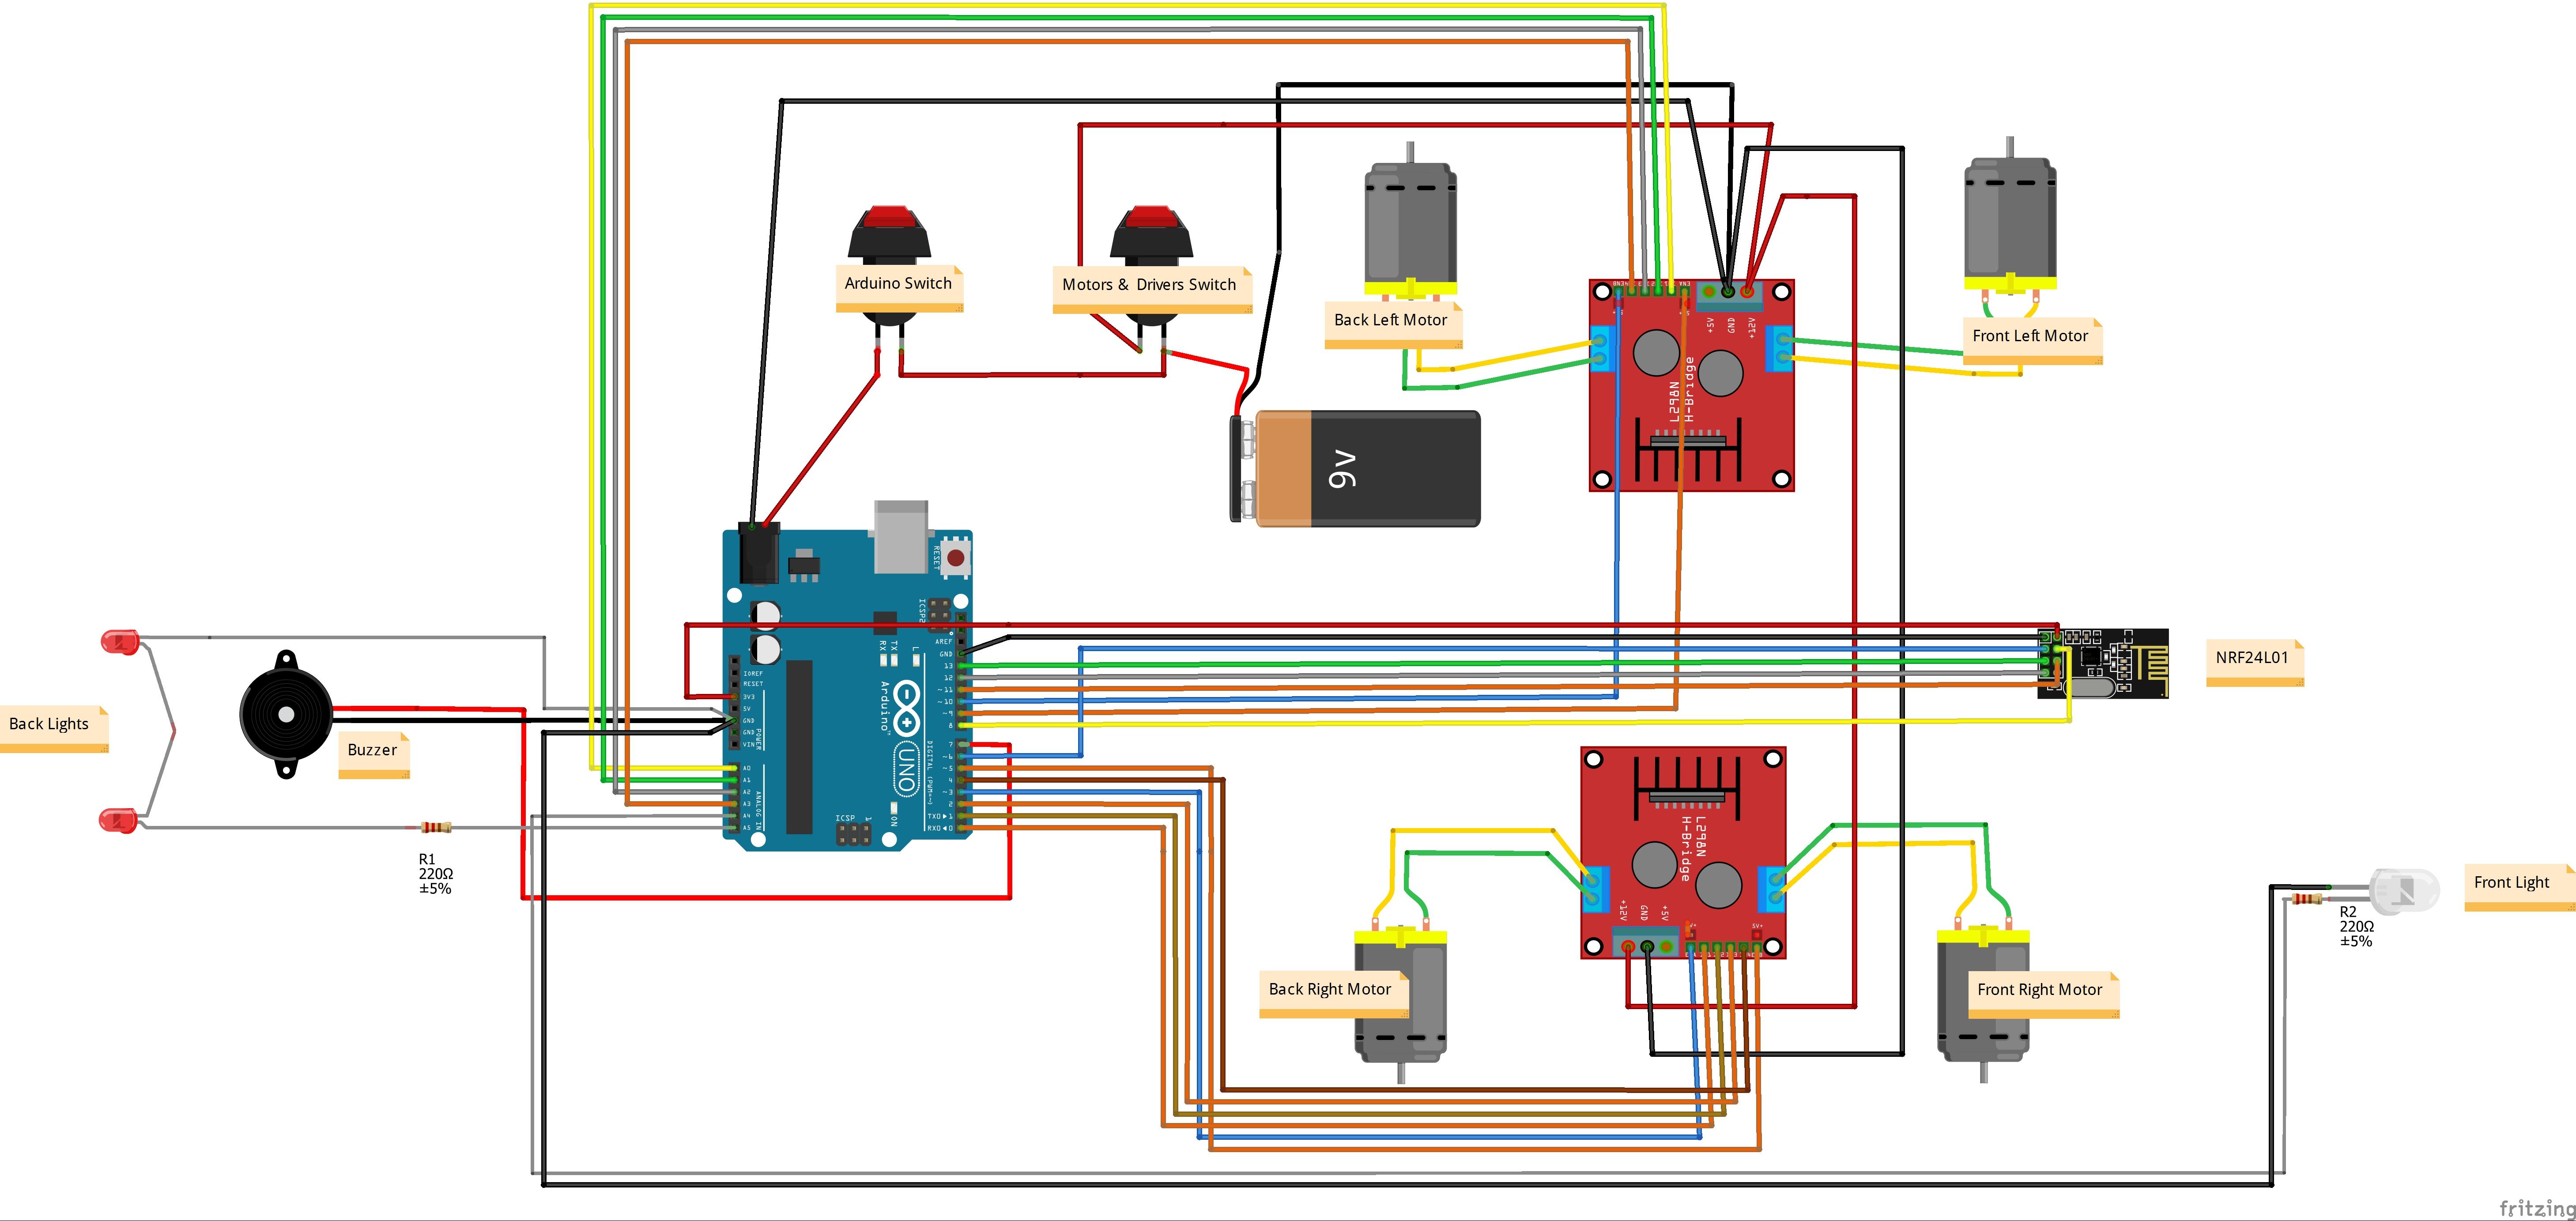 rc car wiring diagram wiring diagrams scematic solidworks rc car of rc car wiring schematic [ 5835 x 2766 Pixel ]